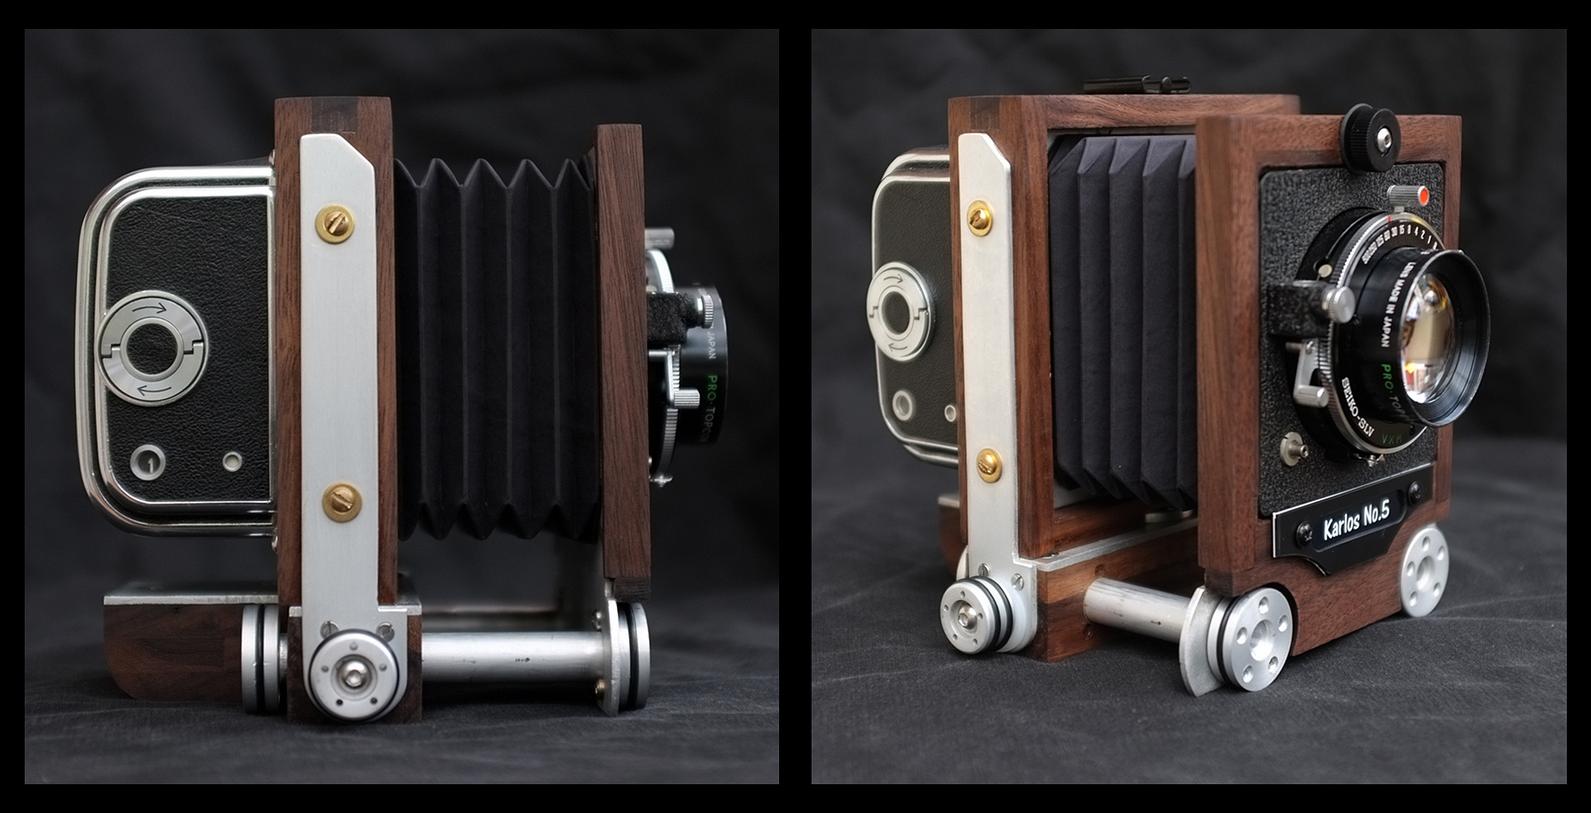 Interesting Diy 6x6 Camera Design The Pinhole Lensboard Changes The